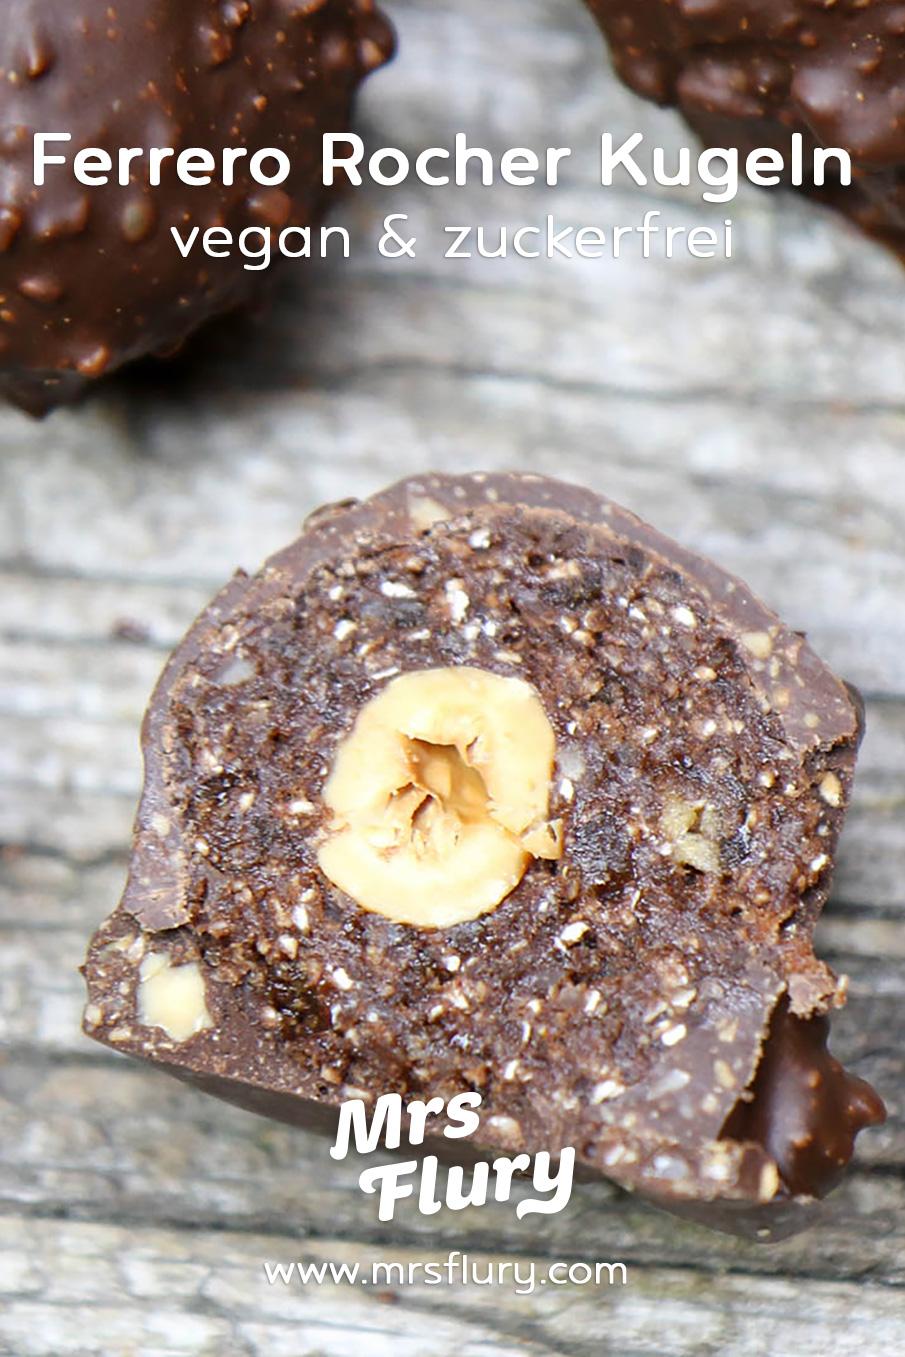 Gesunde Ferrero Rocher Kugeln vegan, zuckerfrei Rezept Mrs Flury